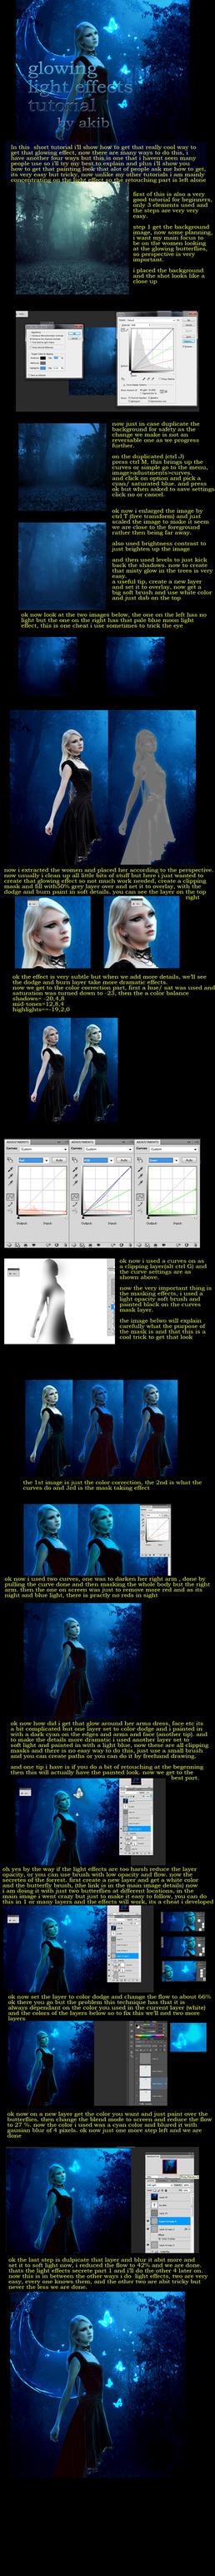 fantasy glow effect/ light effects part 1 by umbatman